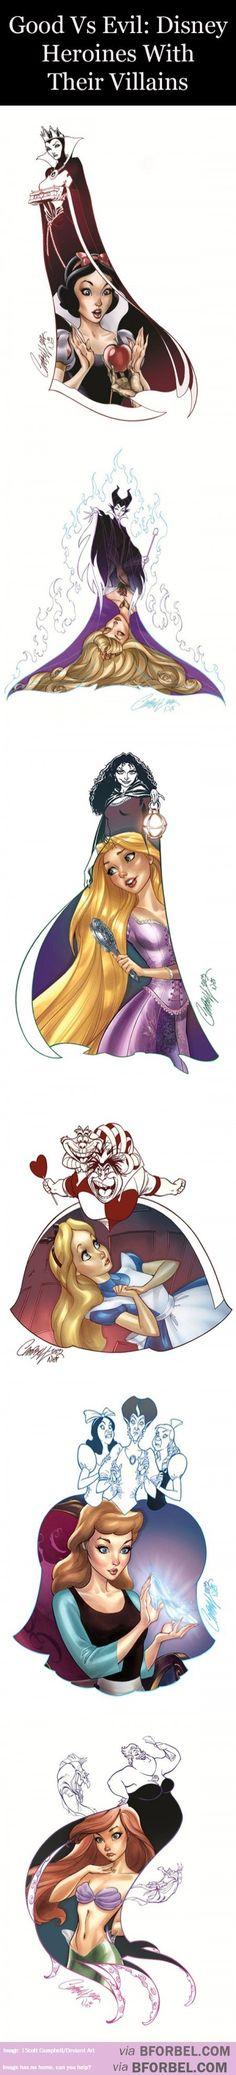 5 Disney Heroines And Their Villains�